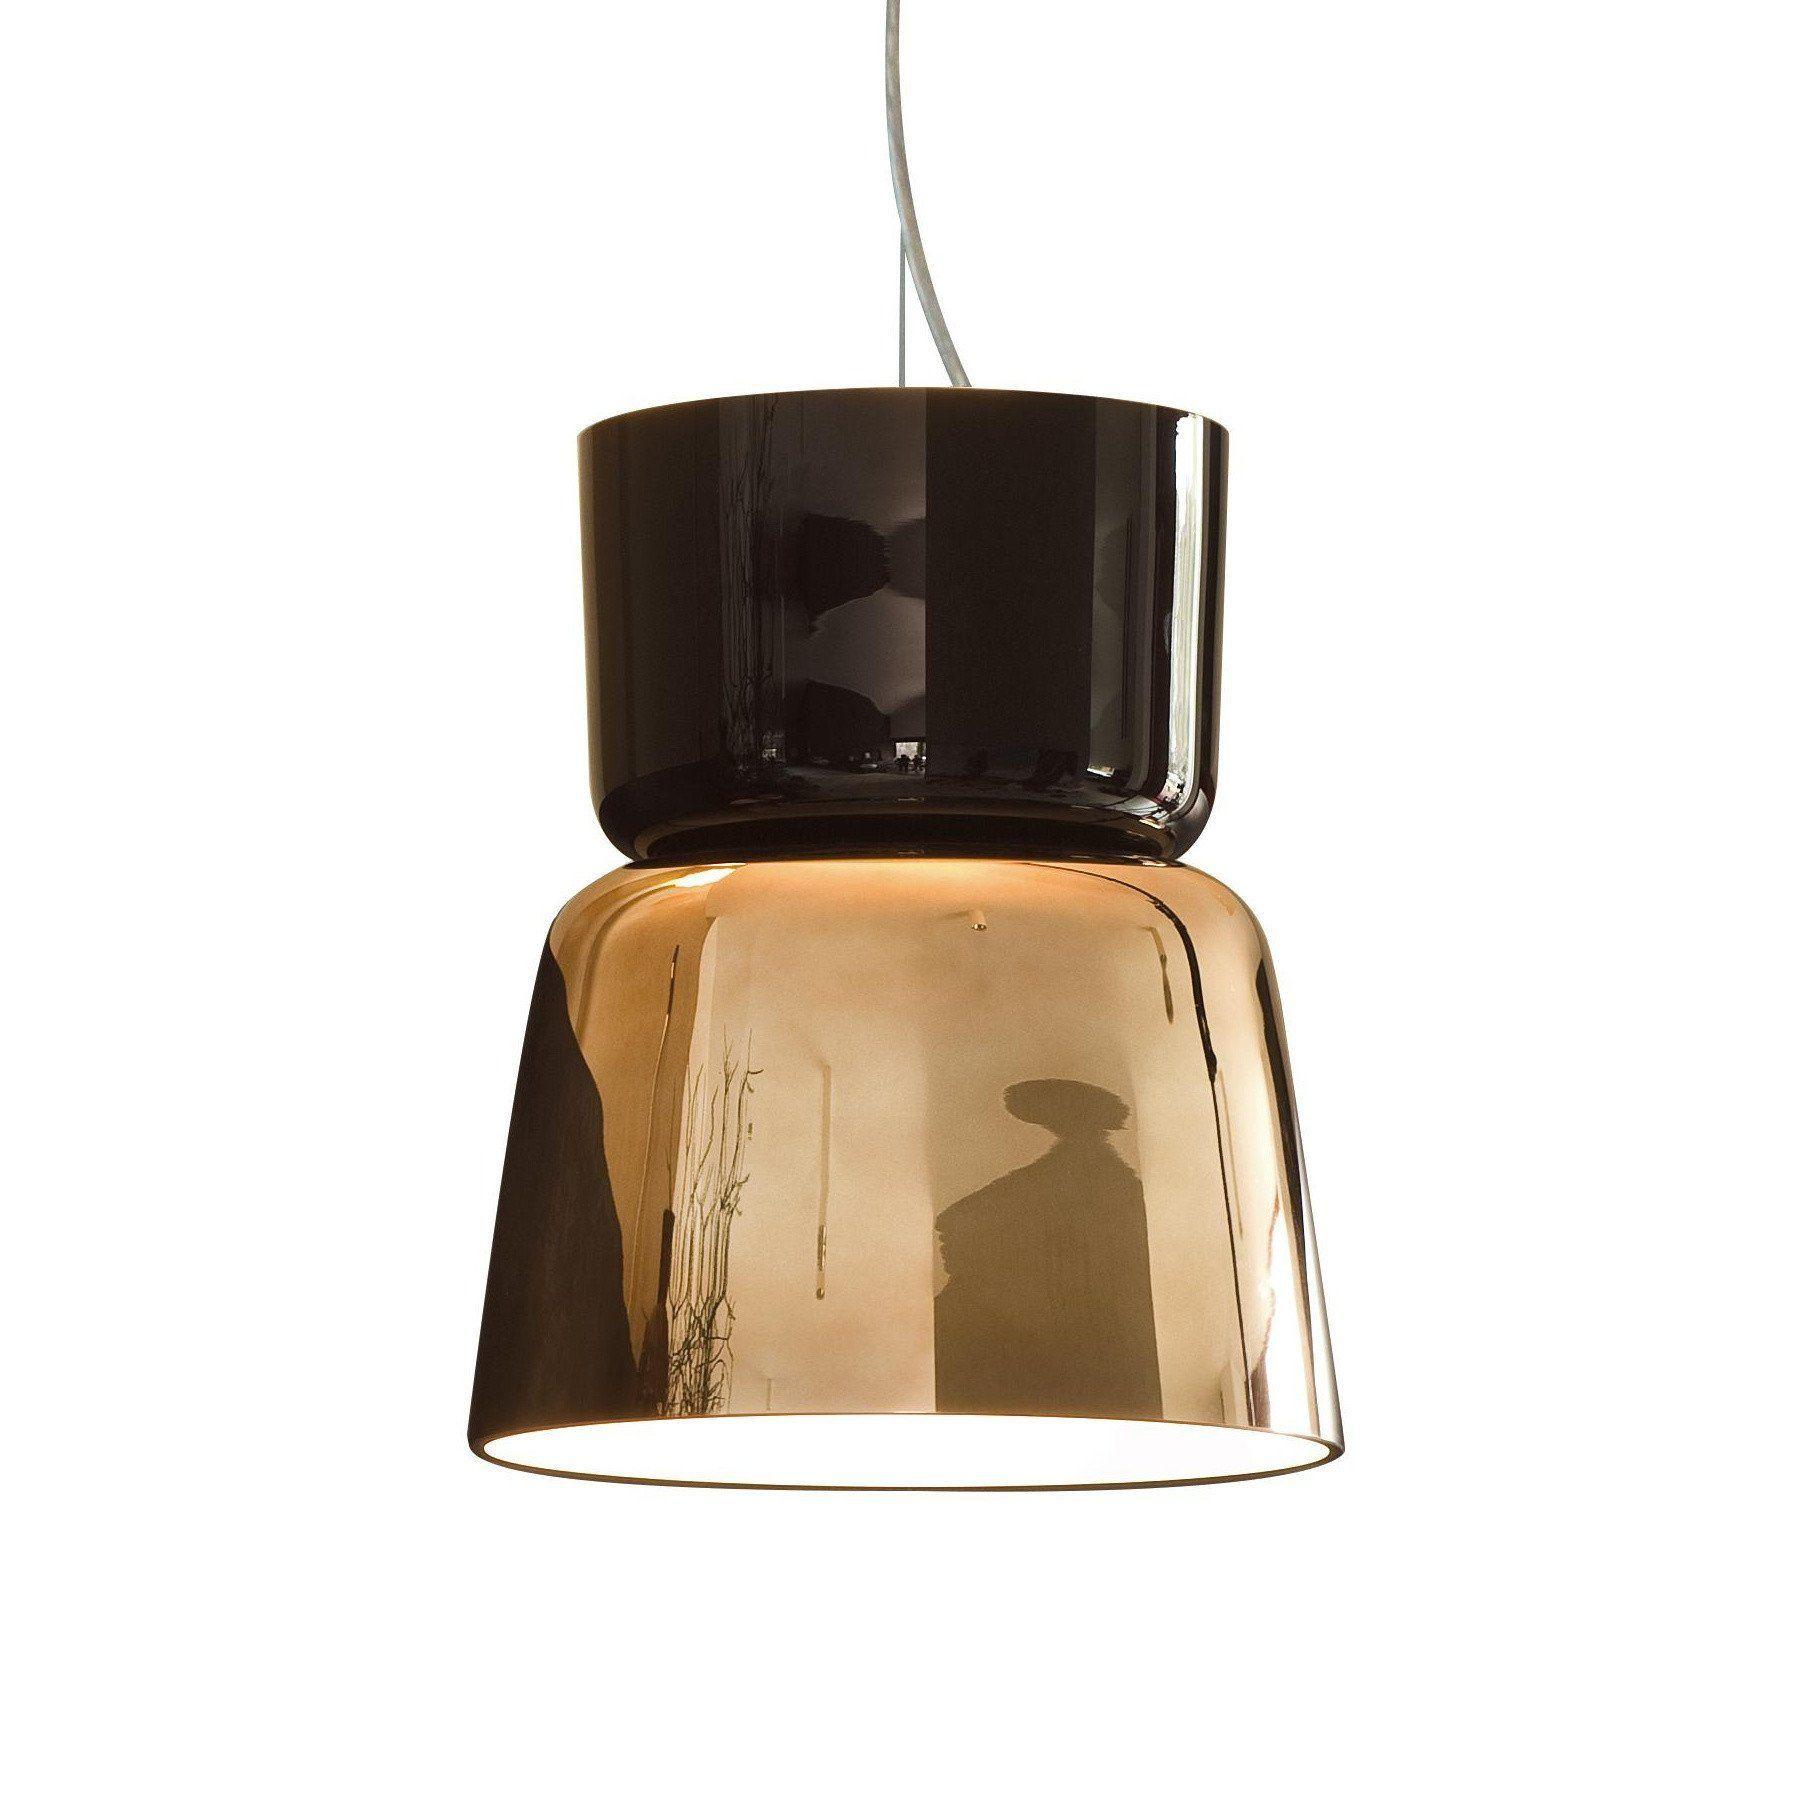 Bloom S5 LED Suspension Lamp Prandina